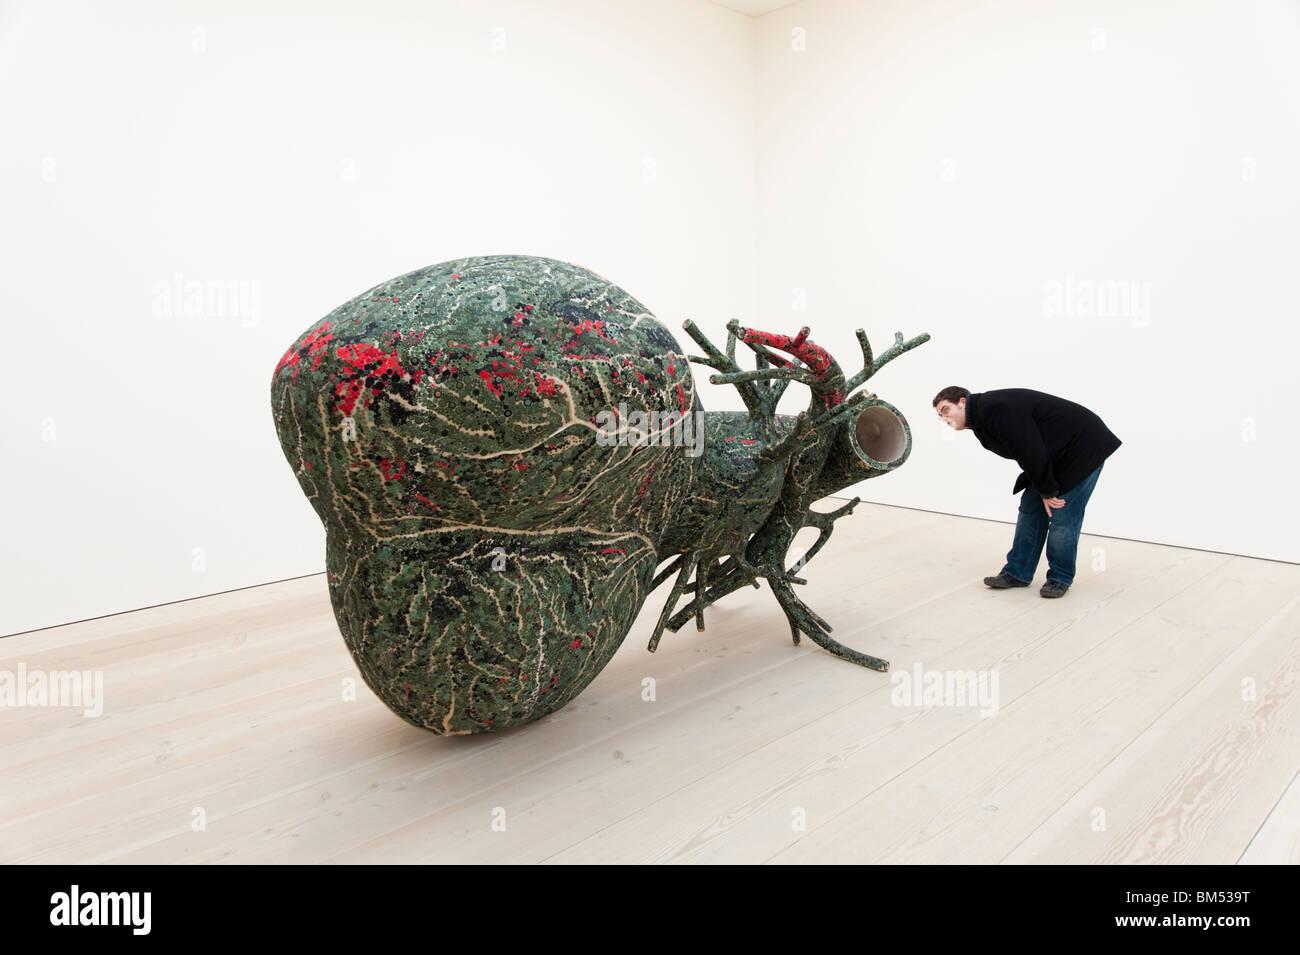 L'art contemporain à la Saatchi Gallery, Londres, Angleterre, Grande-Bretagne, Royaume-Uni Photo Stock